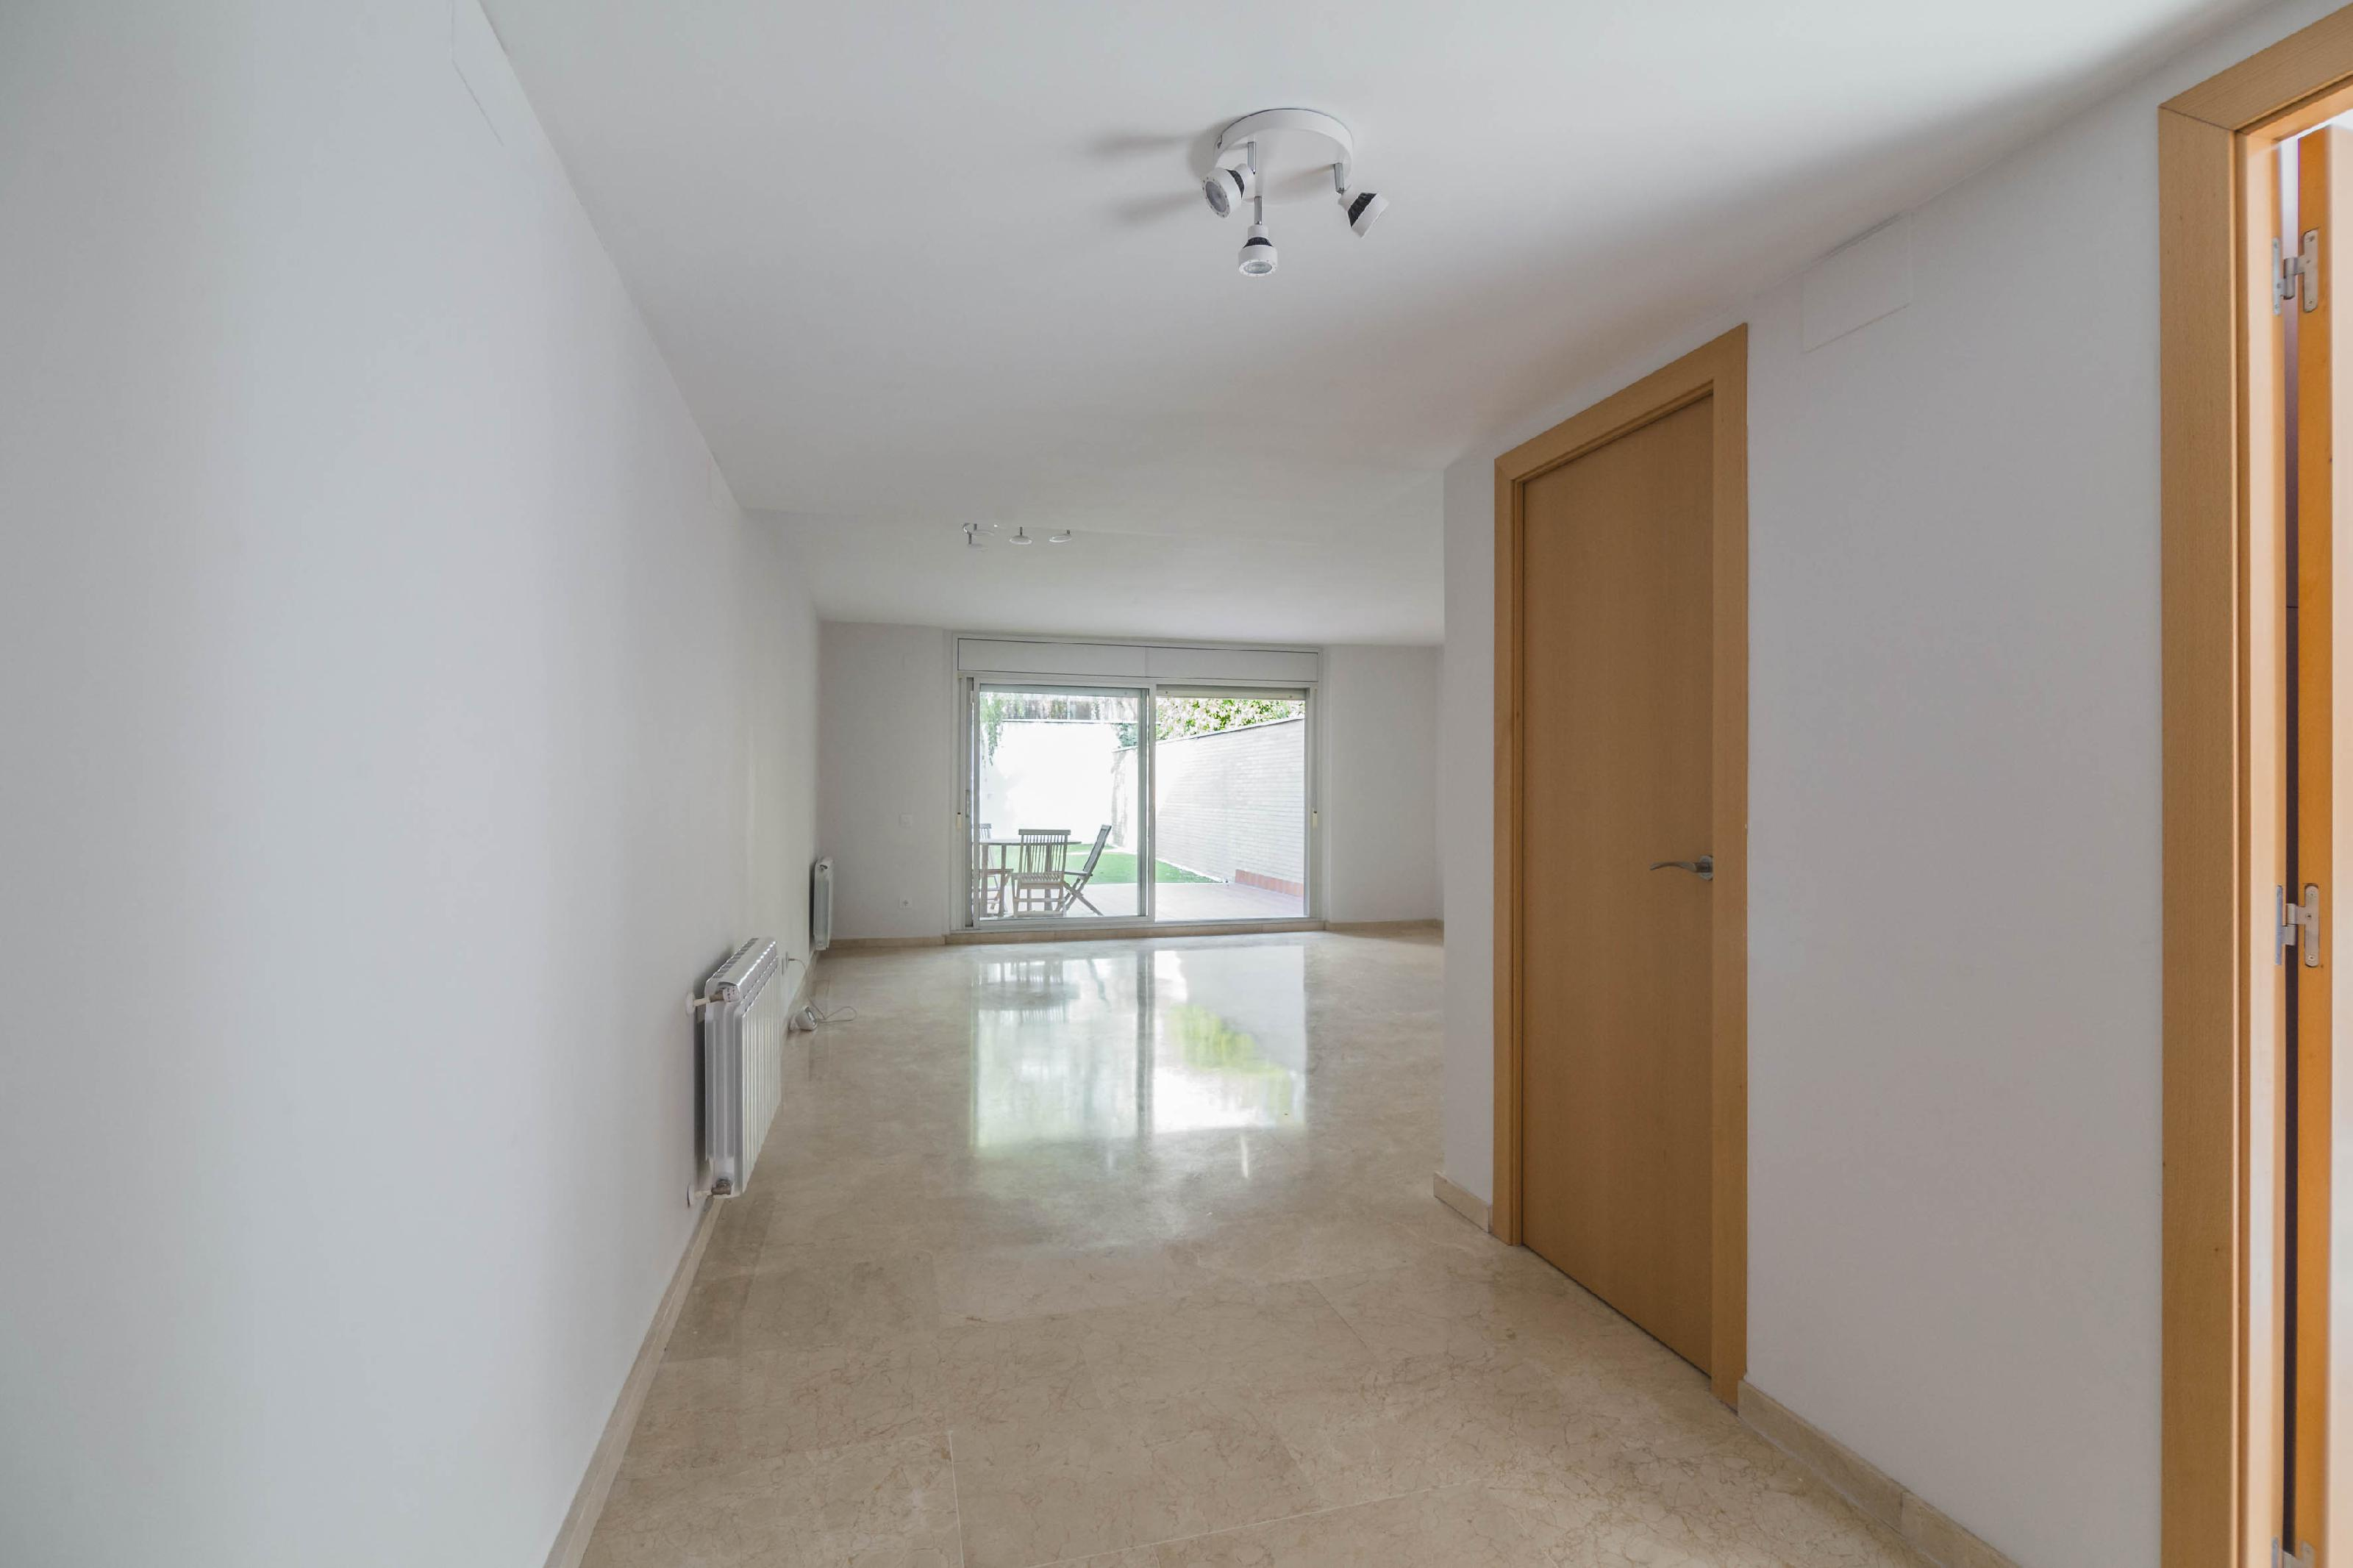 Imagen 4 Casa Adosada en venta en Barcelona / Diagonal Mar - Palo Alto